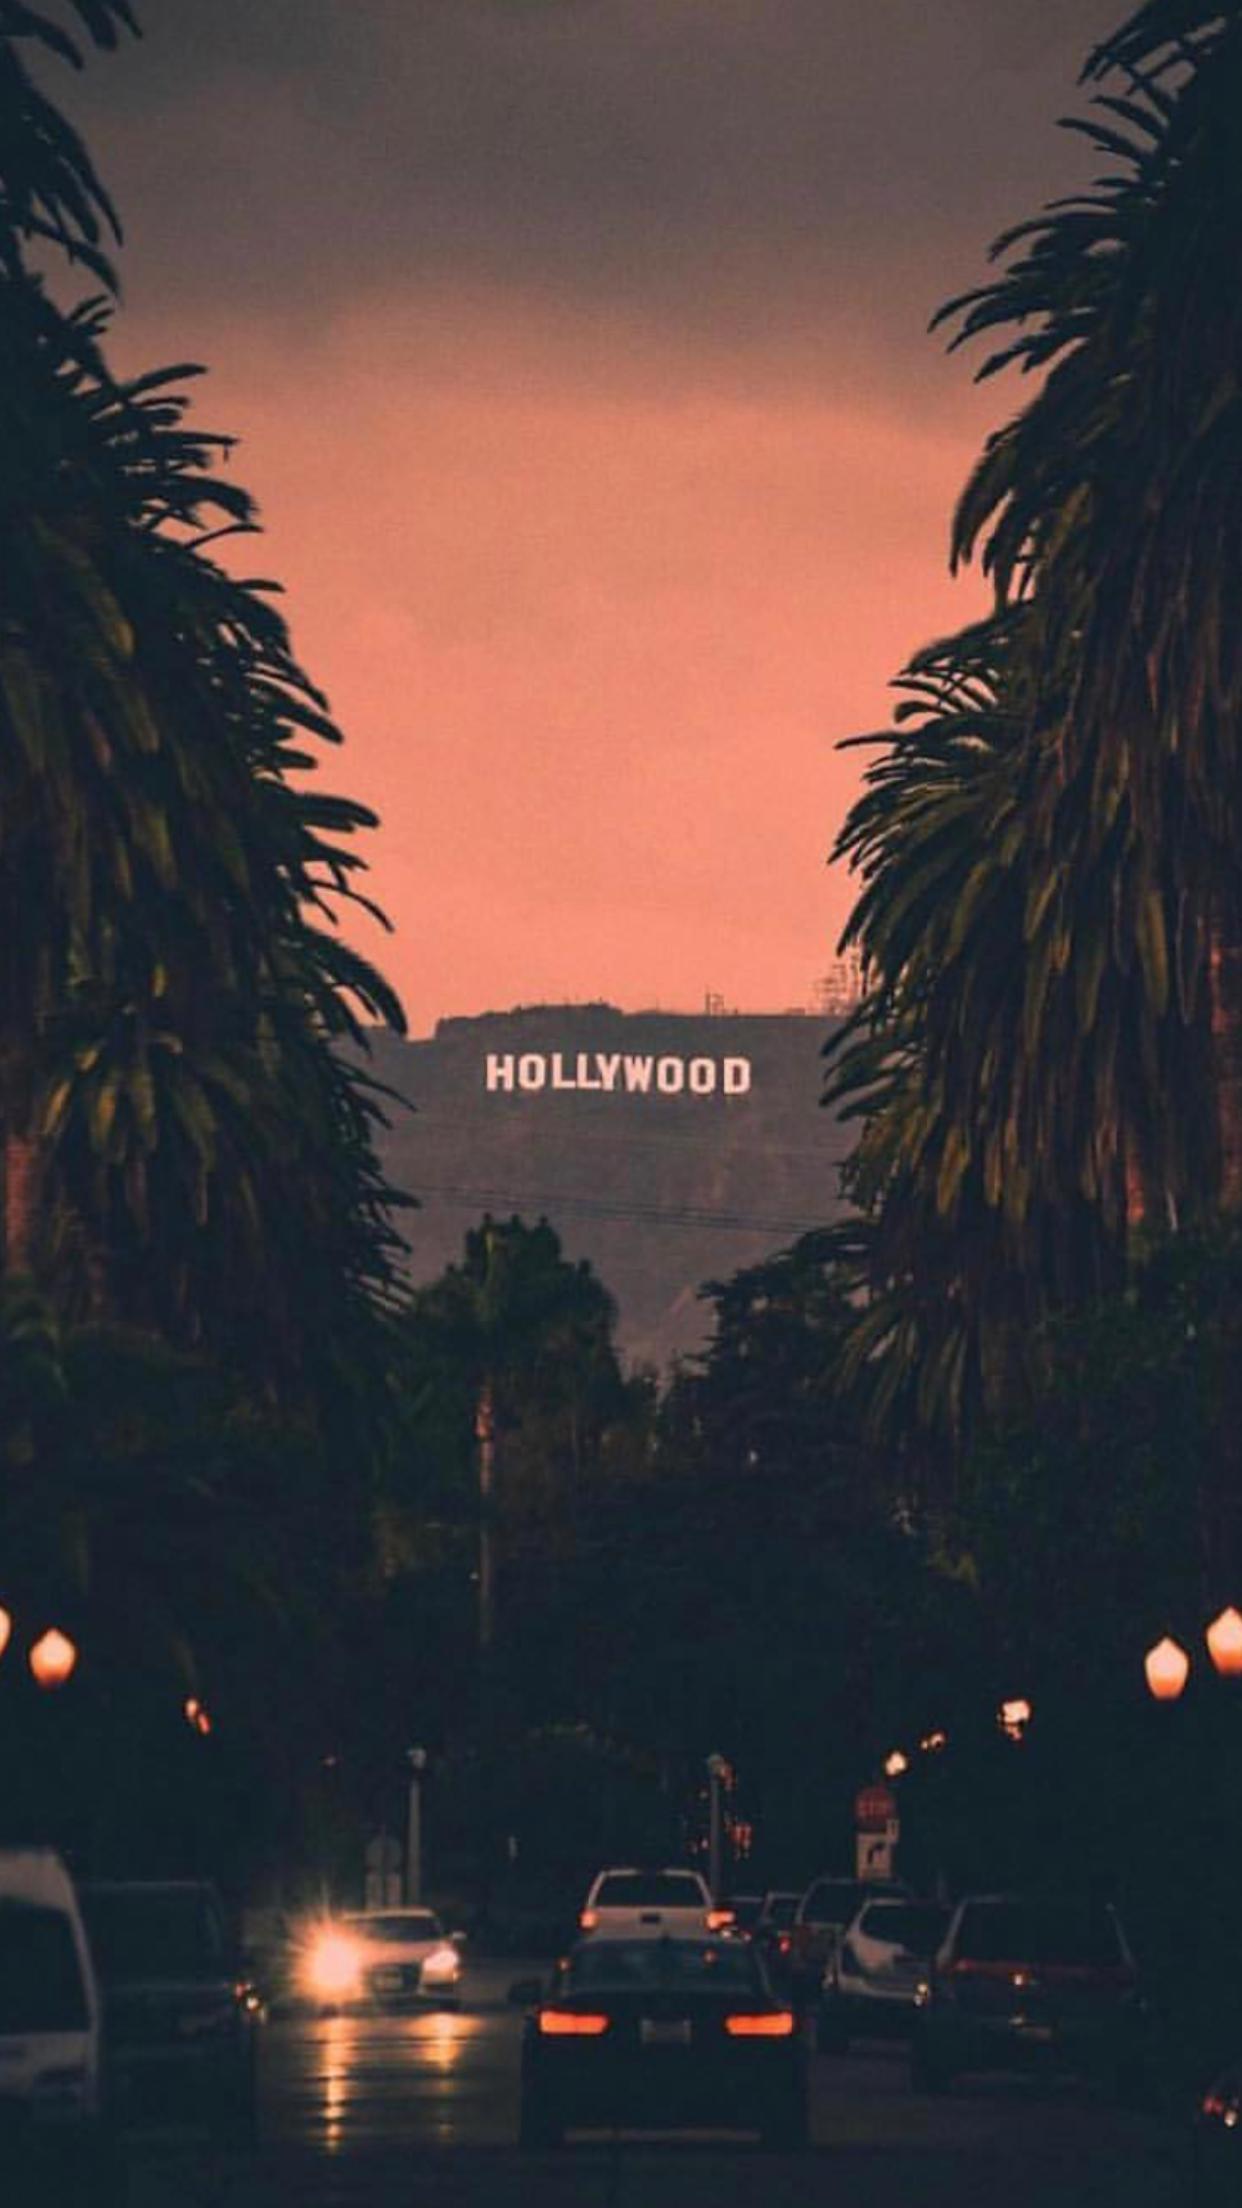 Los Angeles Aesthetic